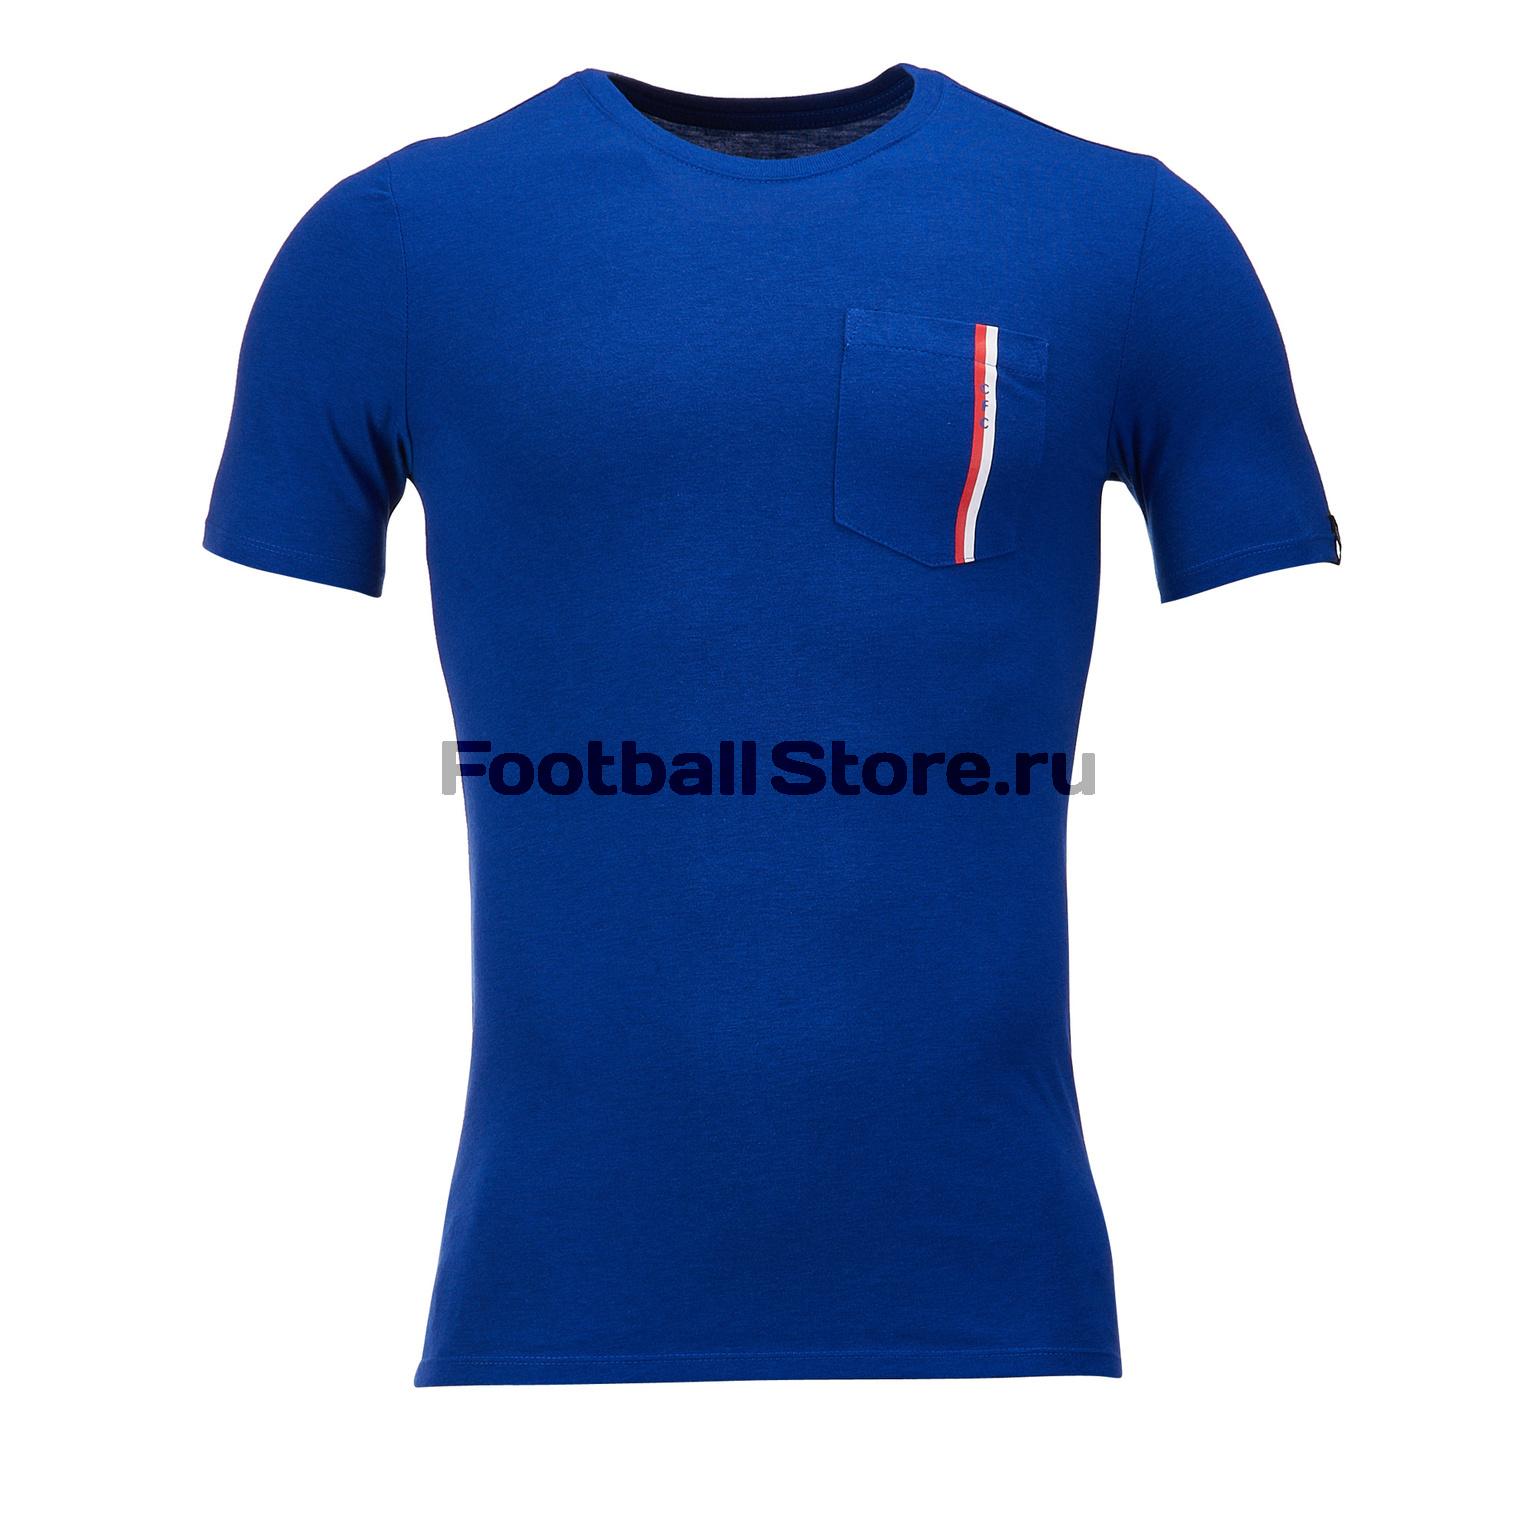 Футболка хлопковая Nike Chelsea Tee Travel AA5411-495 футболка хлопковая nike tee club19 ss aj1504 451